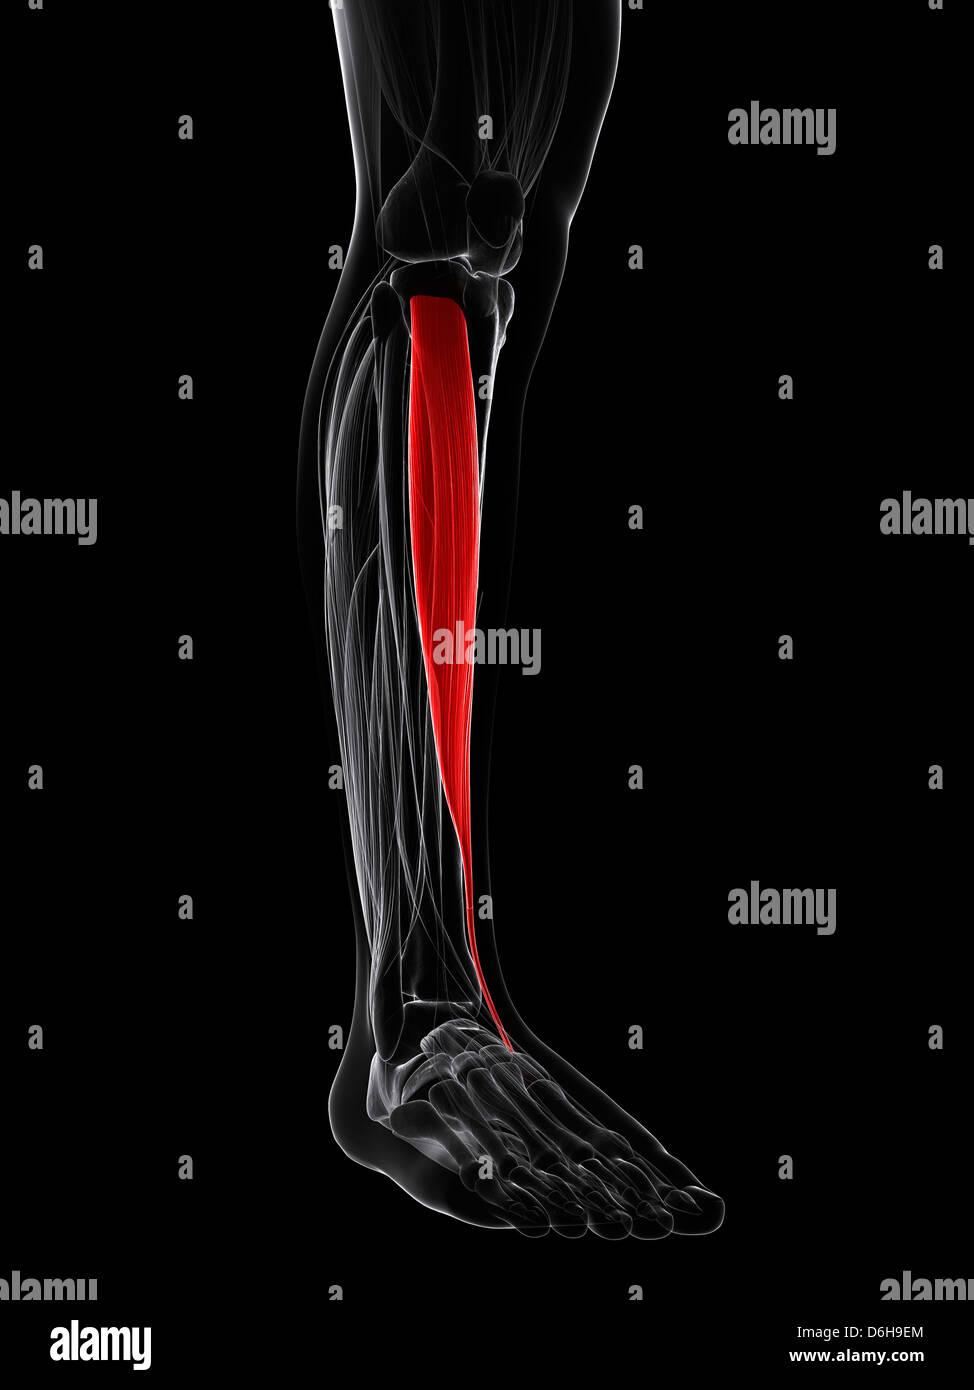 Tibialis Anterior Muscle Stockfotos & Tibialis Anterior Muscle ...